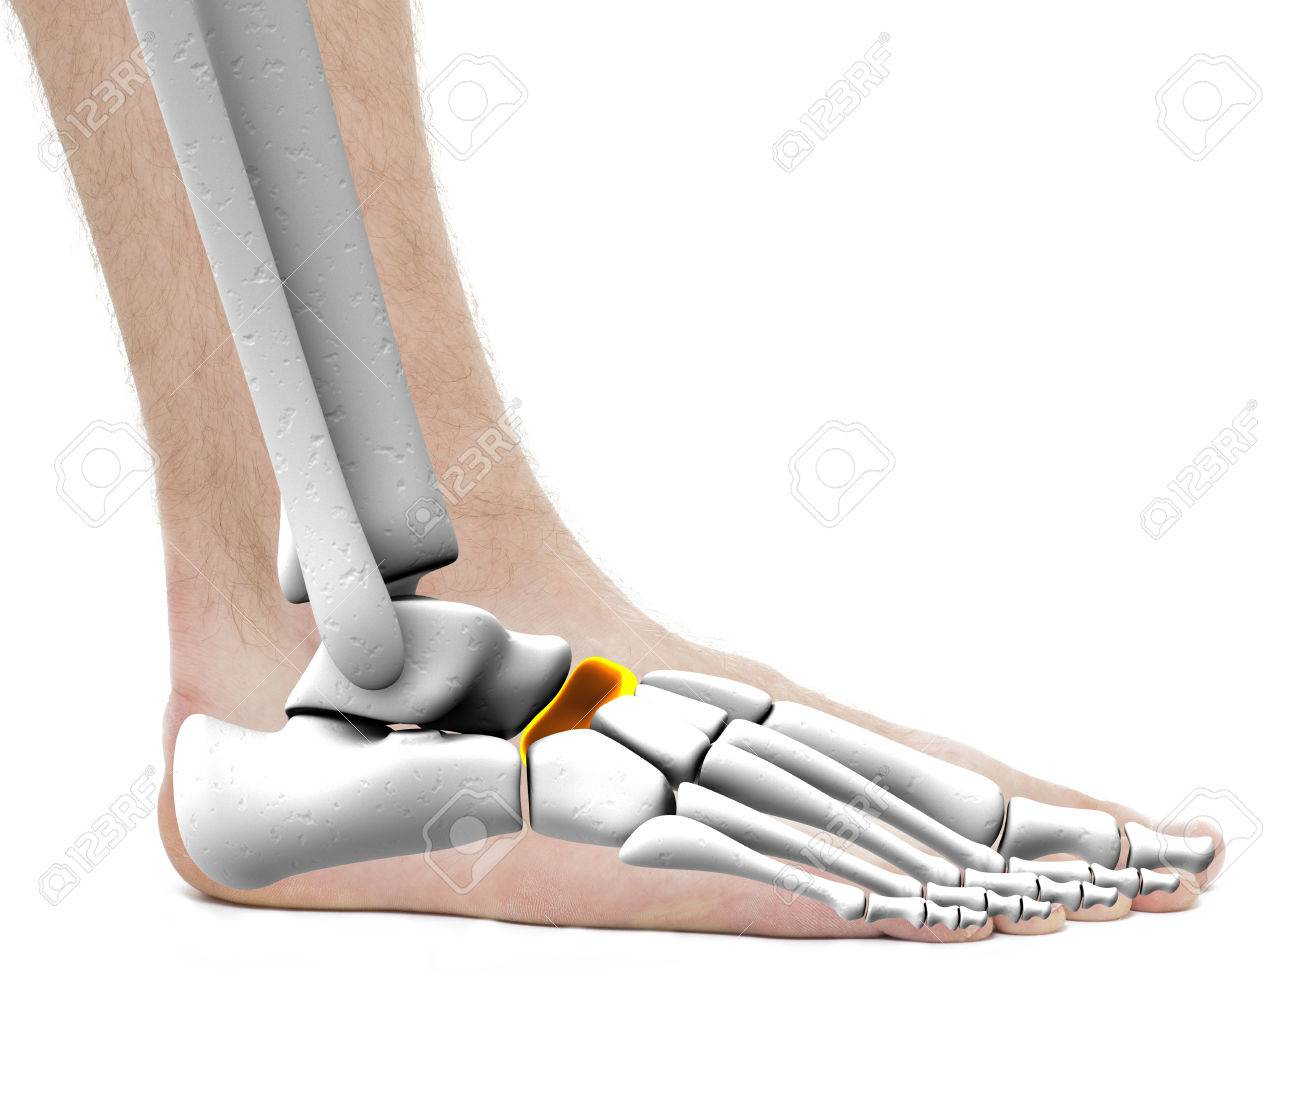 Scaphoid Bone - Anatomie Male - Studio Foto Auf Weißem Lizenzfreie ...